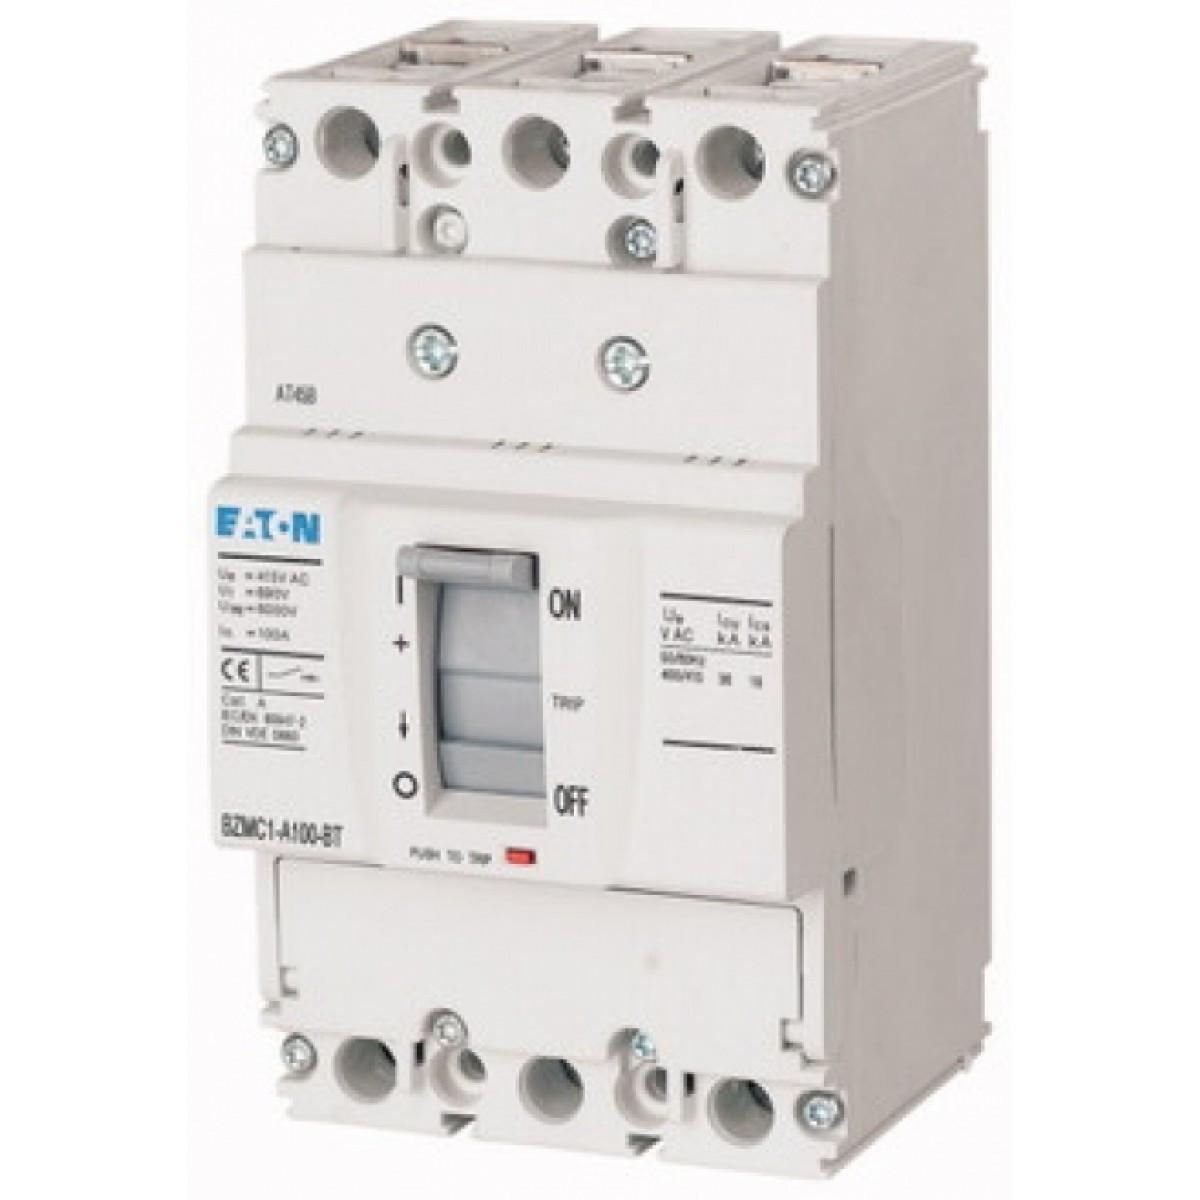 Вимикач автоматичний BZMB1-A100-BT (100А 25кА) Eaton (109759)